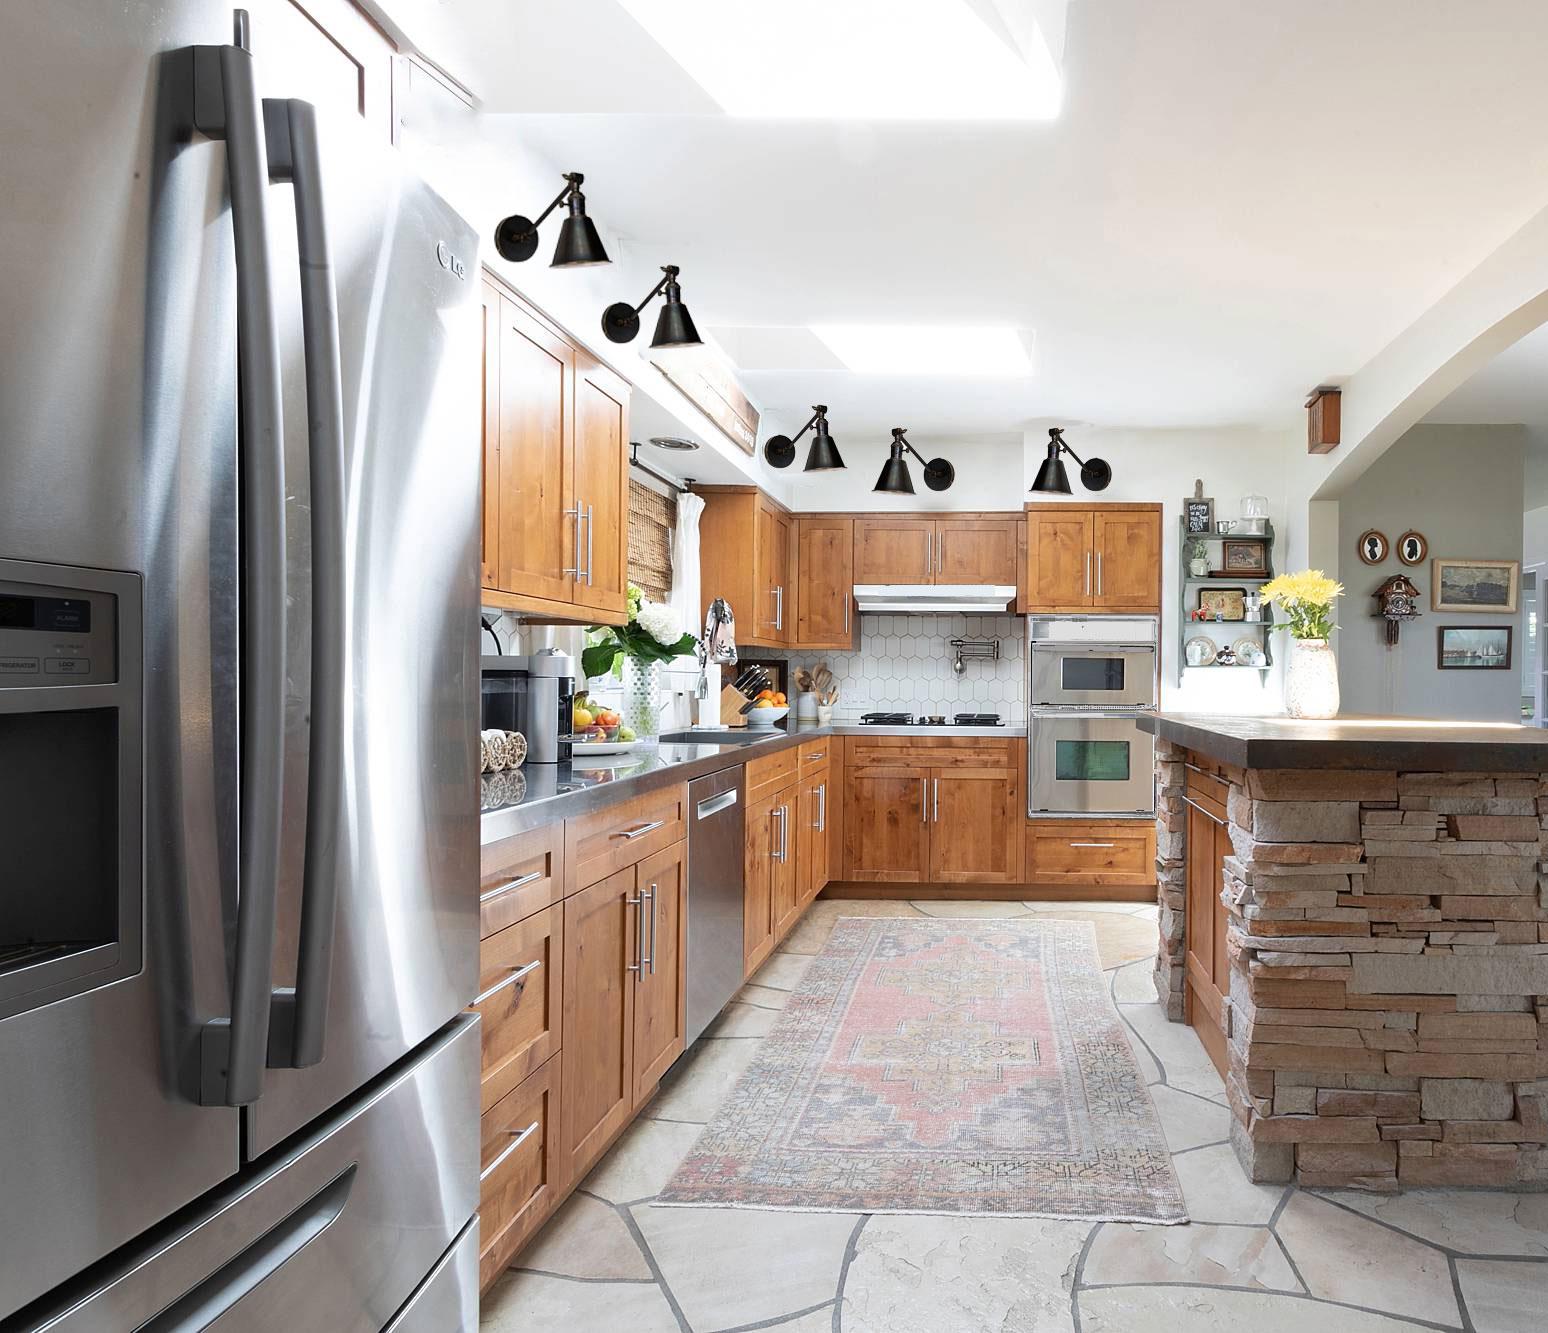 kitchen mock up with black bronze sconce